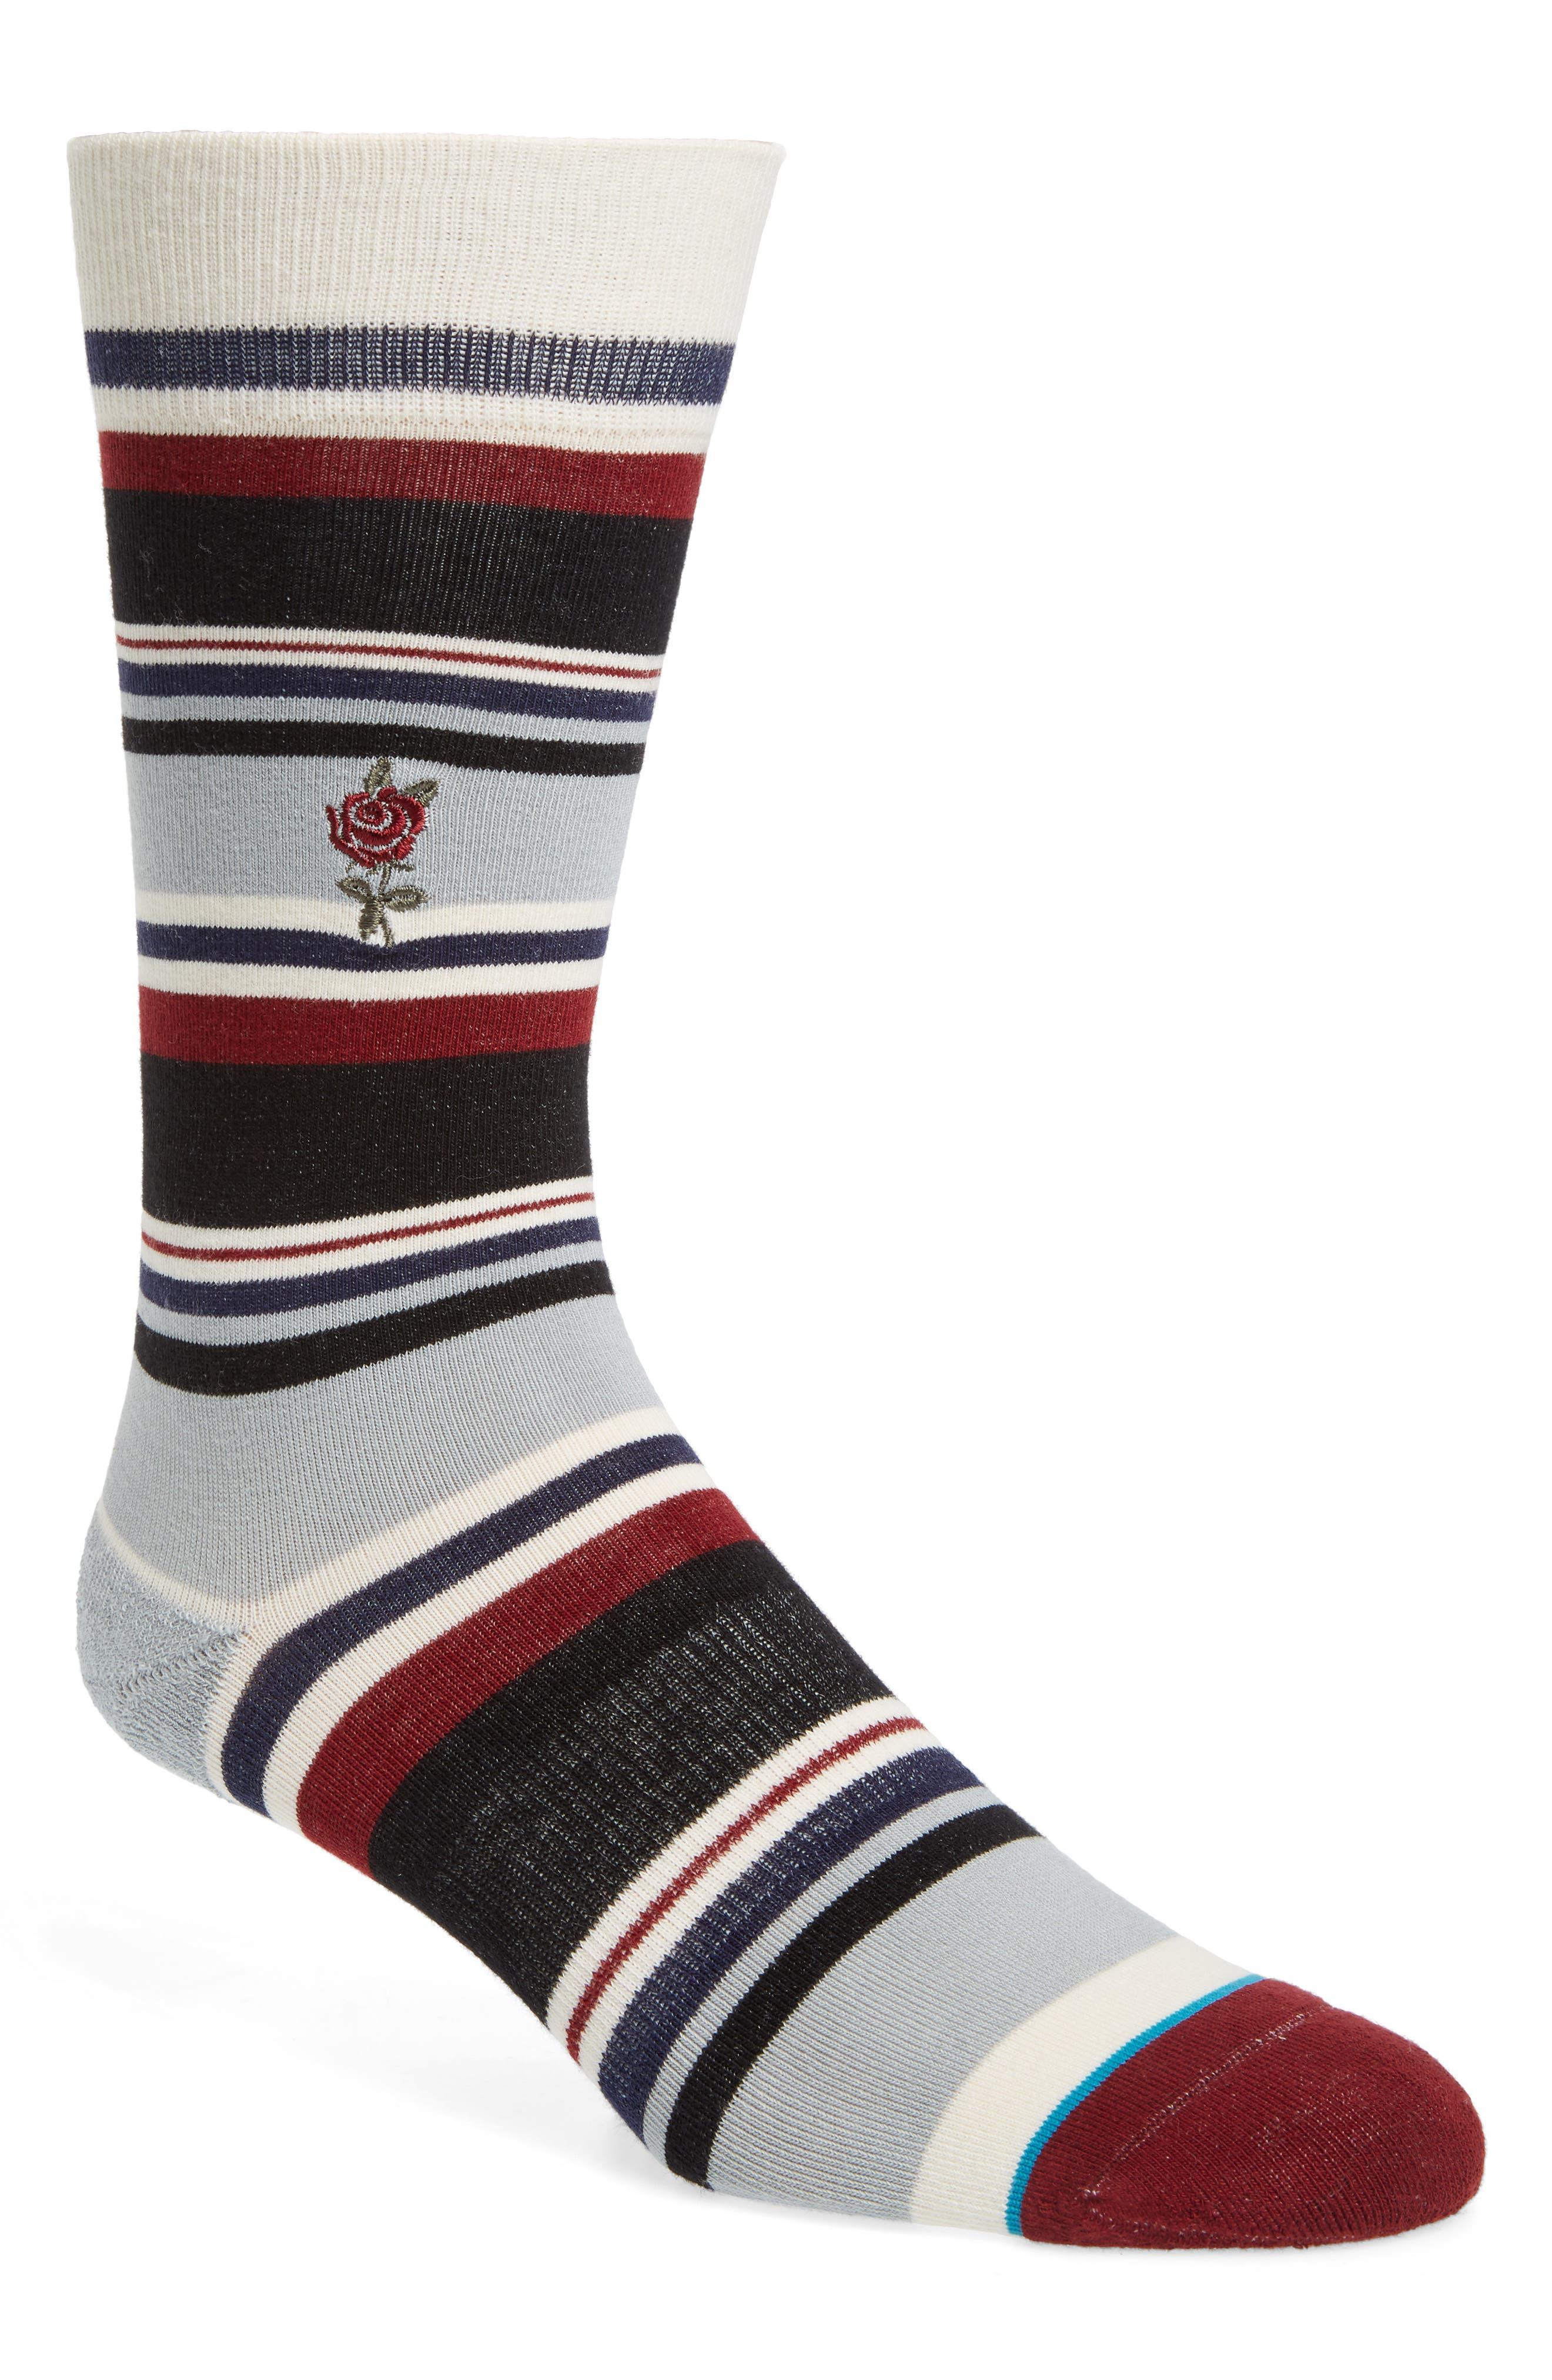 Eldridge Socks,                             Main thumbnail 1, color,                             Black/ Red Multi